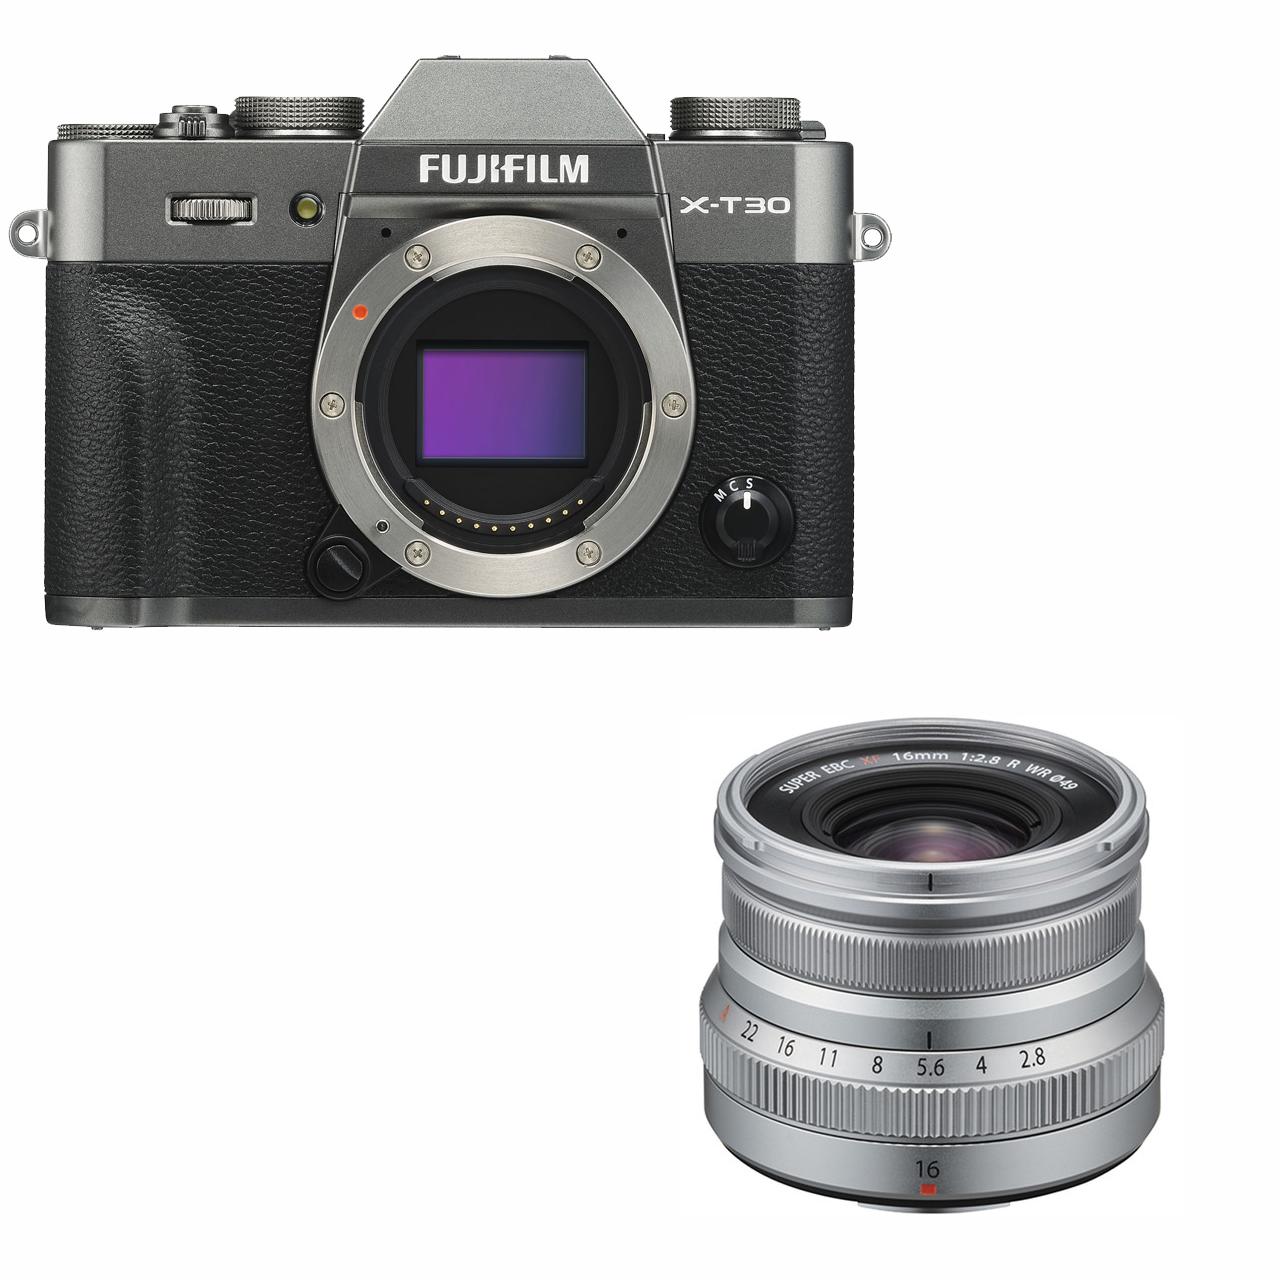 Fujifilm X-T30 mørk sølv + XF 16mm XF 16mm f/2.8 WR sølv